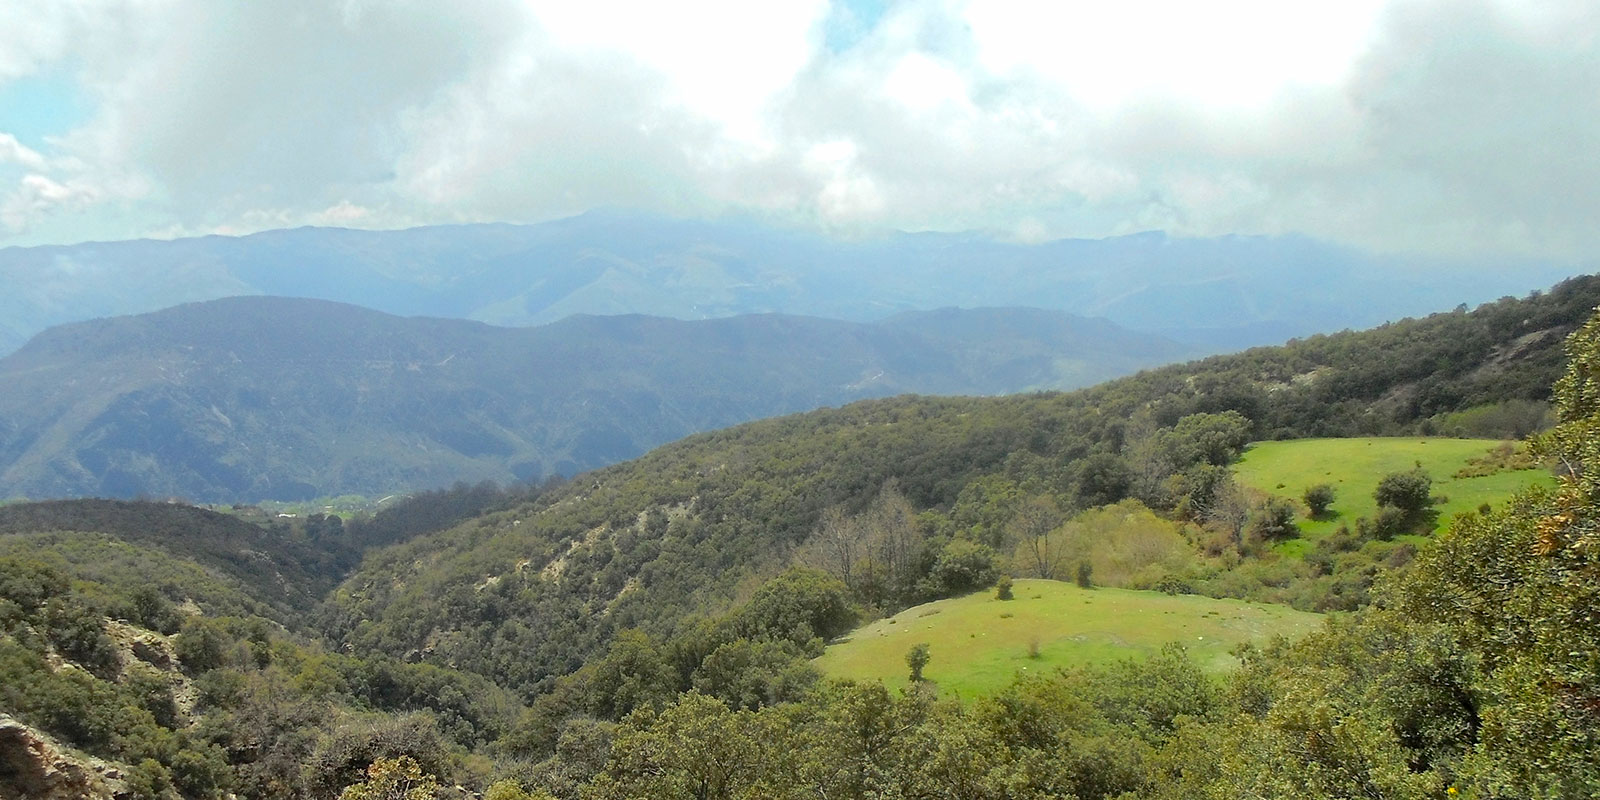 Sierra Nevada Spain and surrounding areas